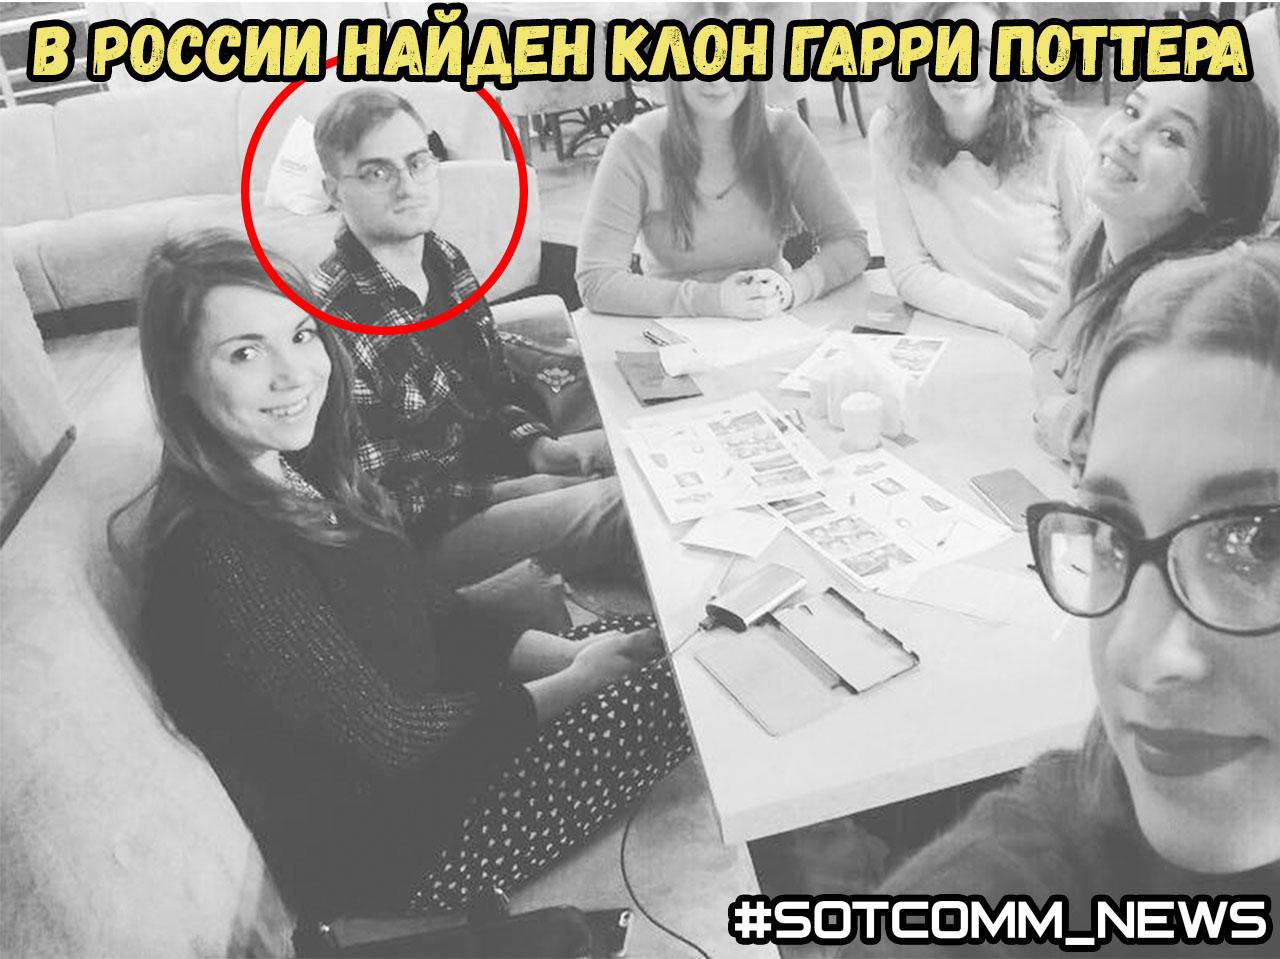 В Красноярске найден клон Гарри Поттера